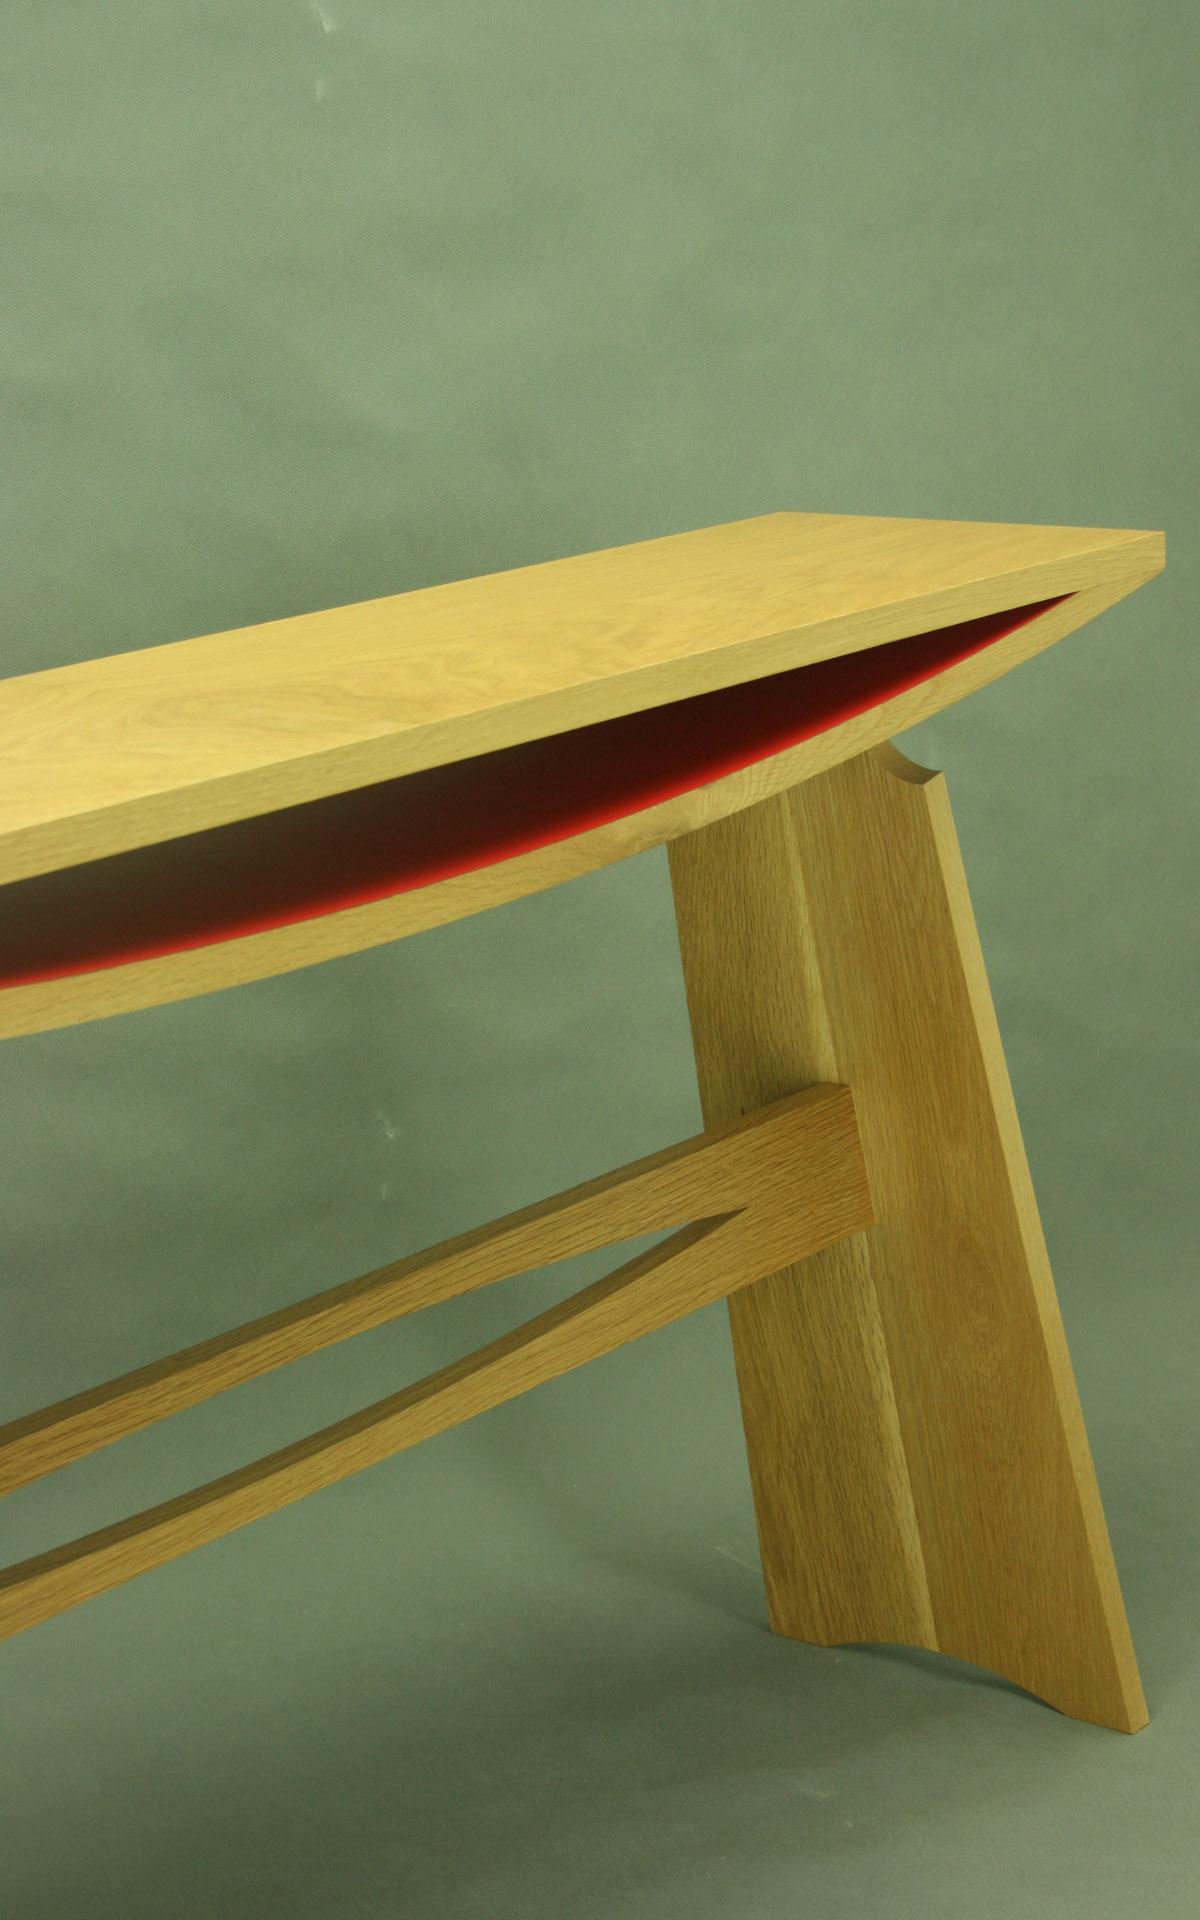 Chifley Sideboard